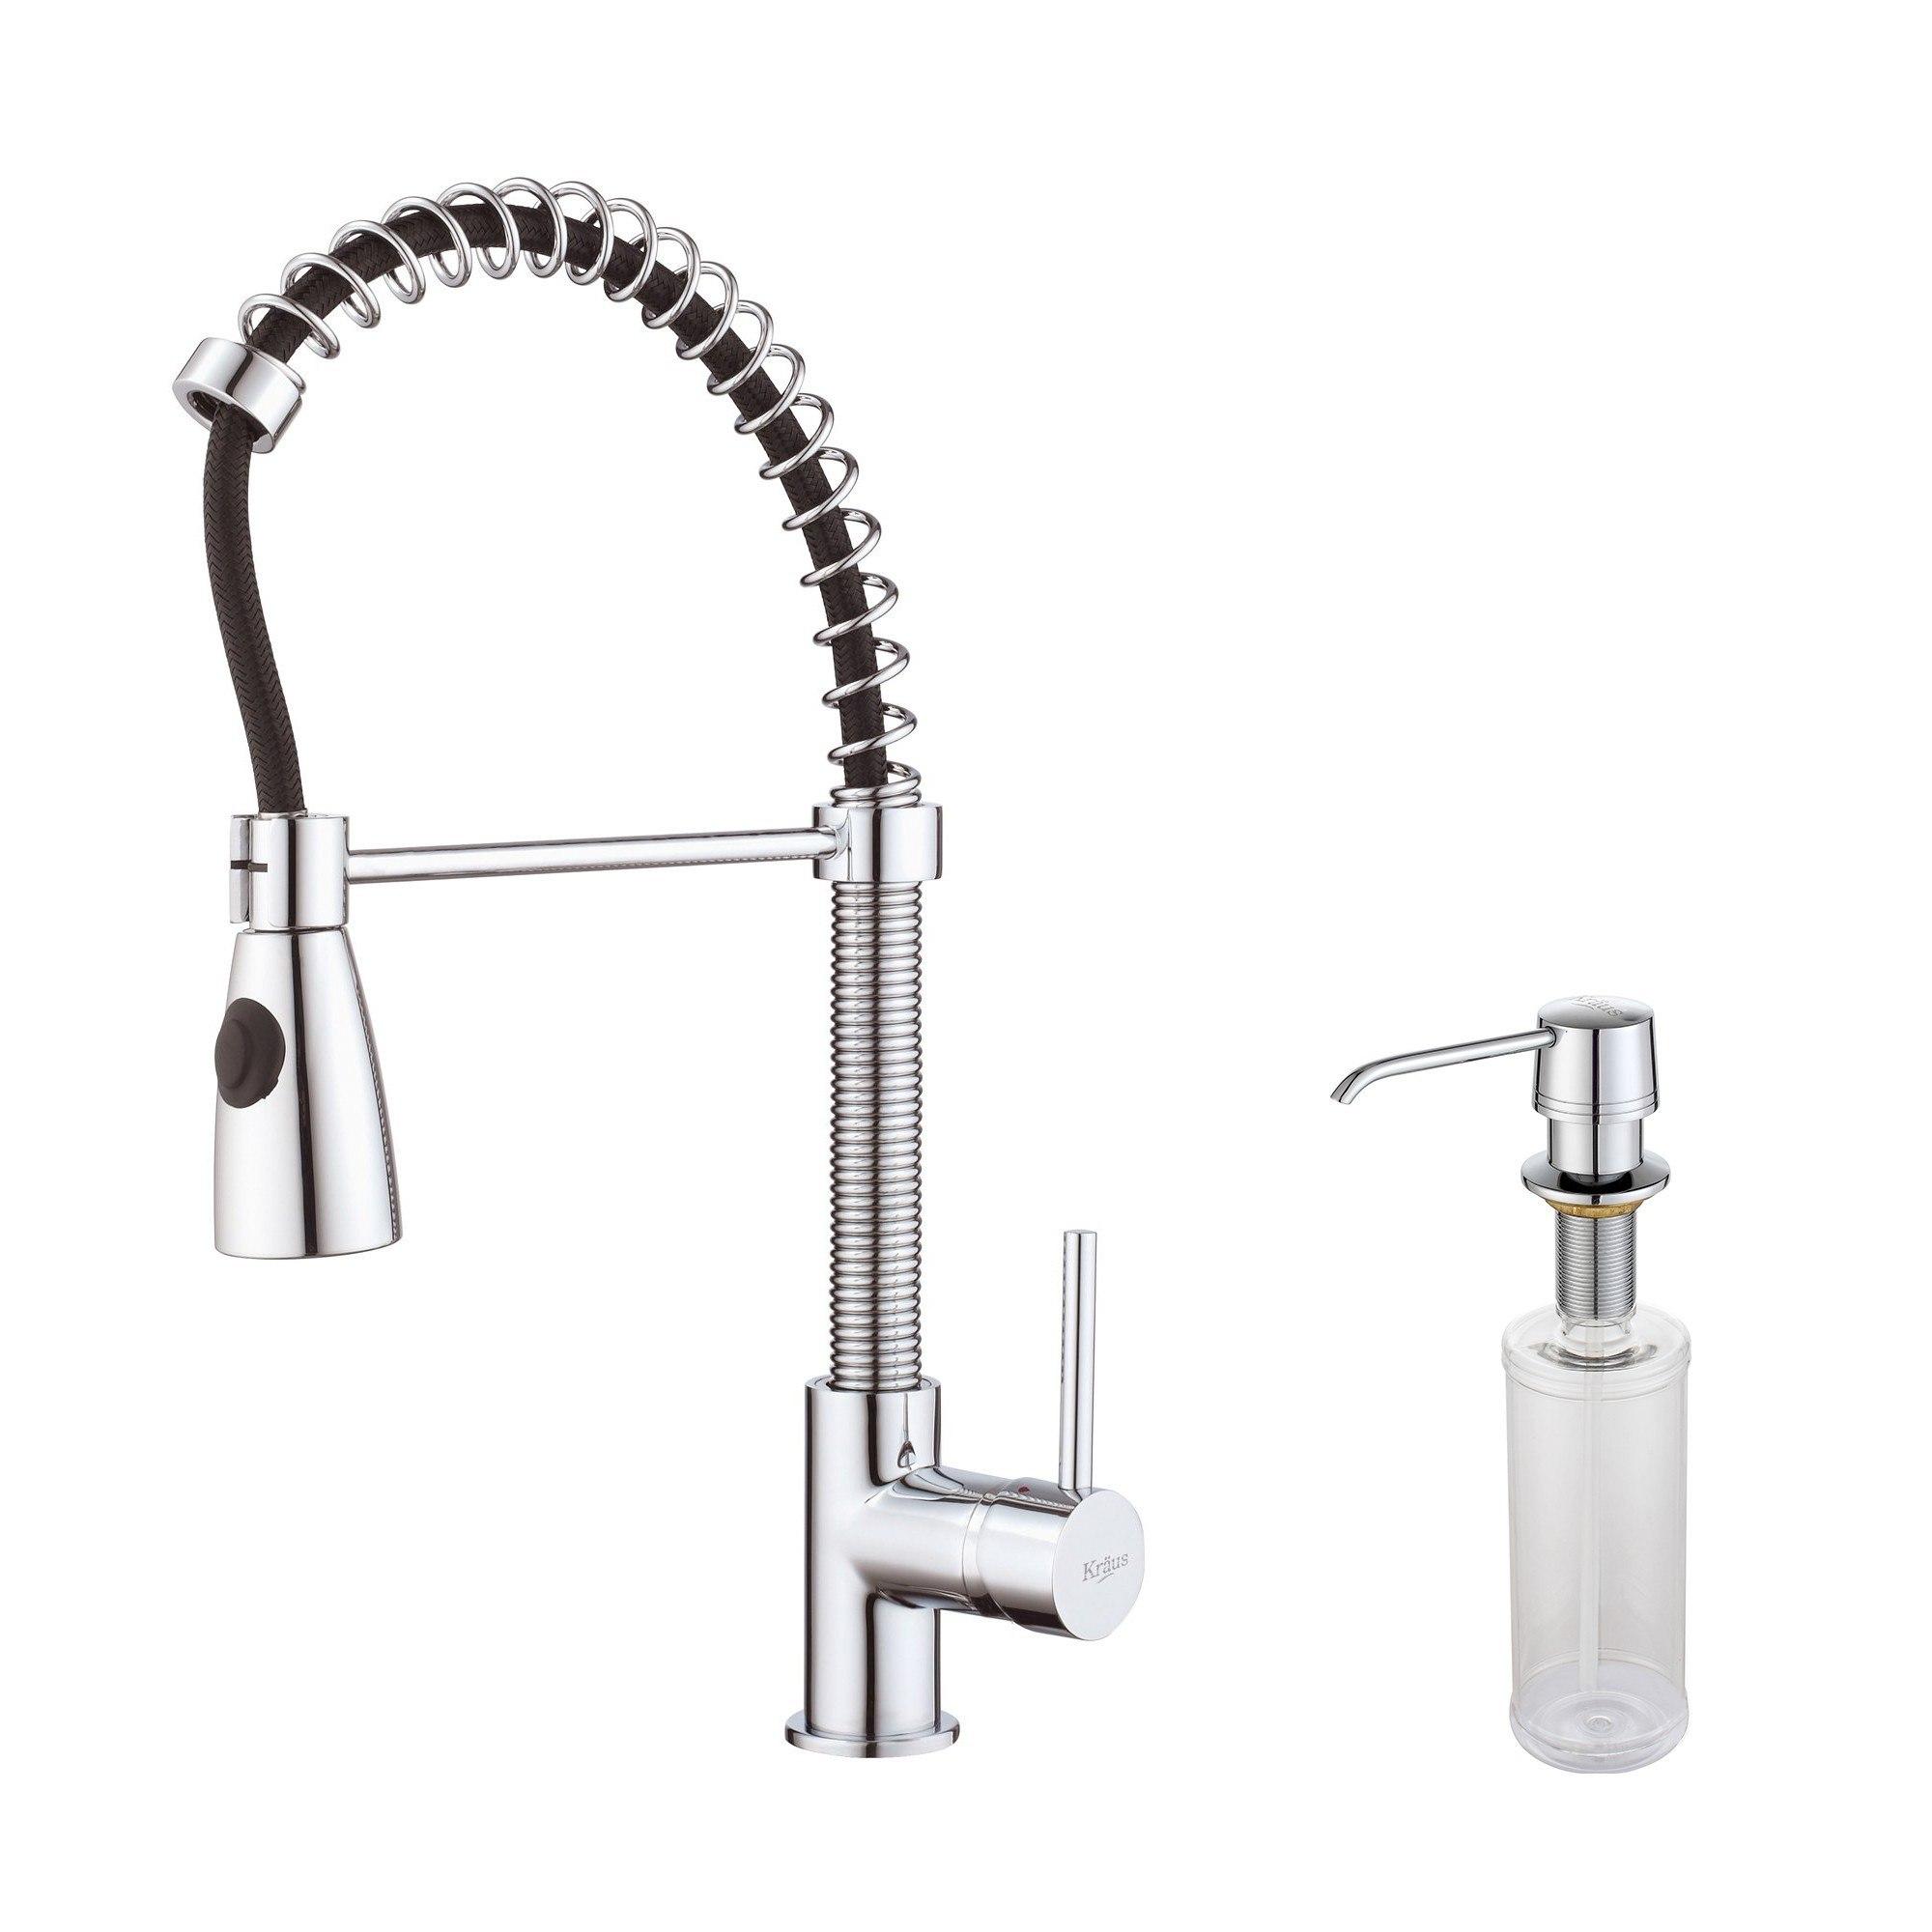 Kraus KPF-1612-KSD-30 Single Lever Pull Out Kitchen Faucet & Soap Dispenser